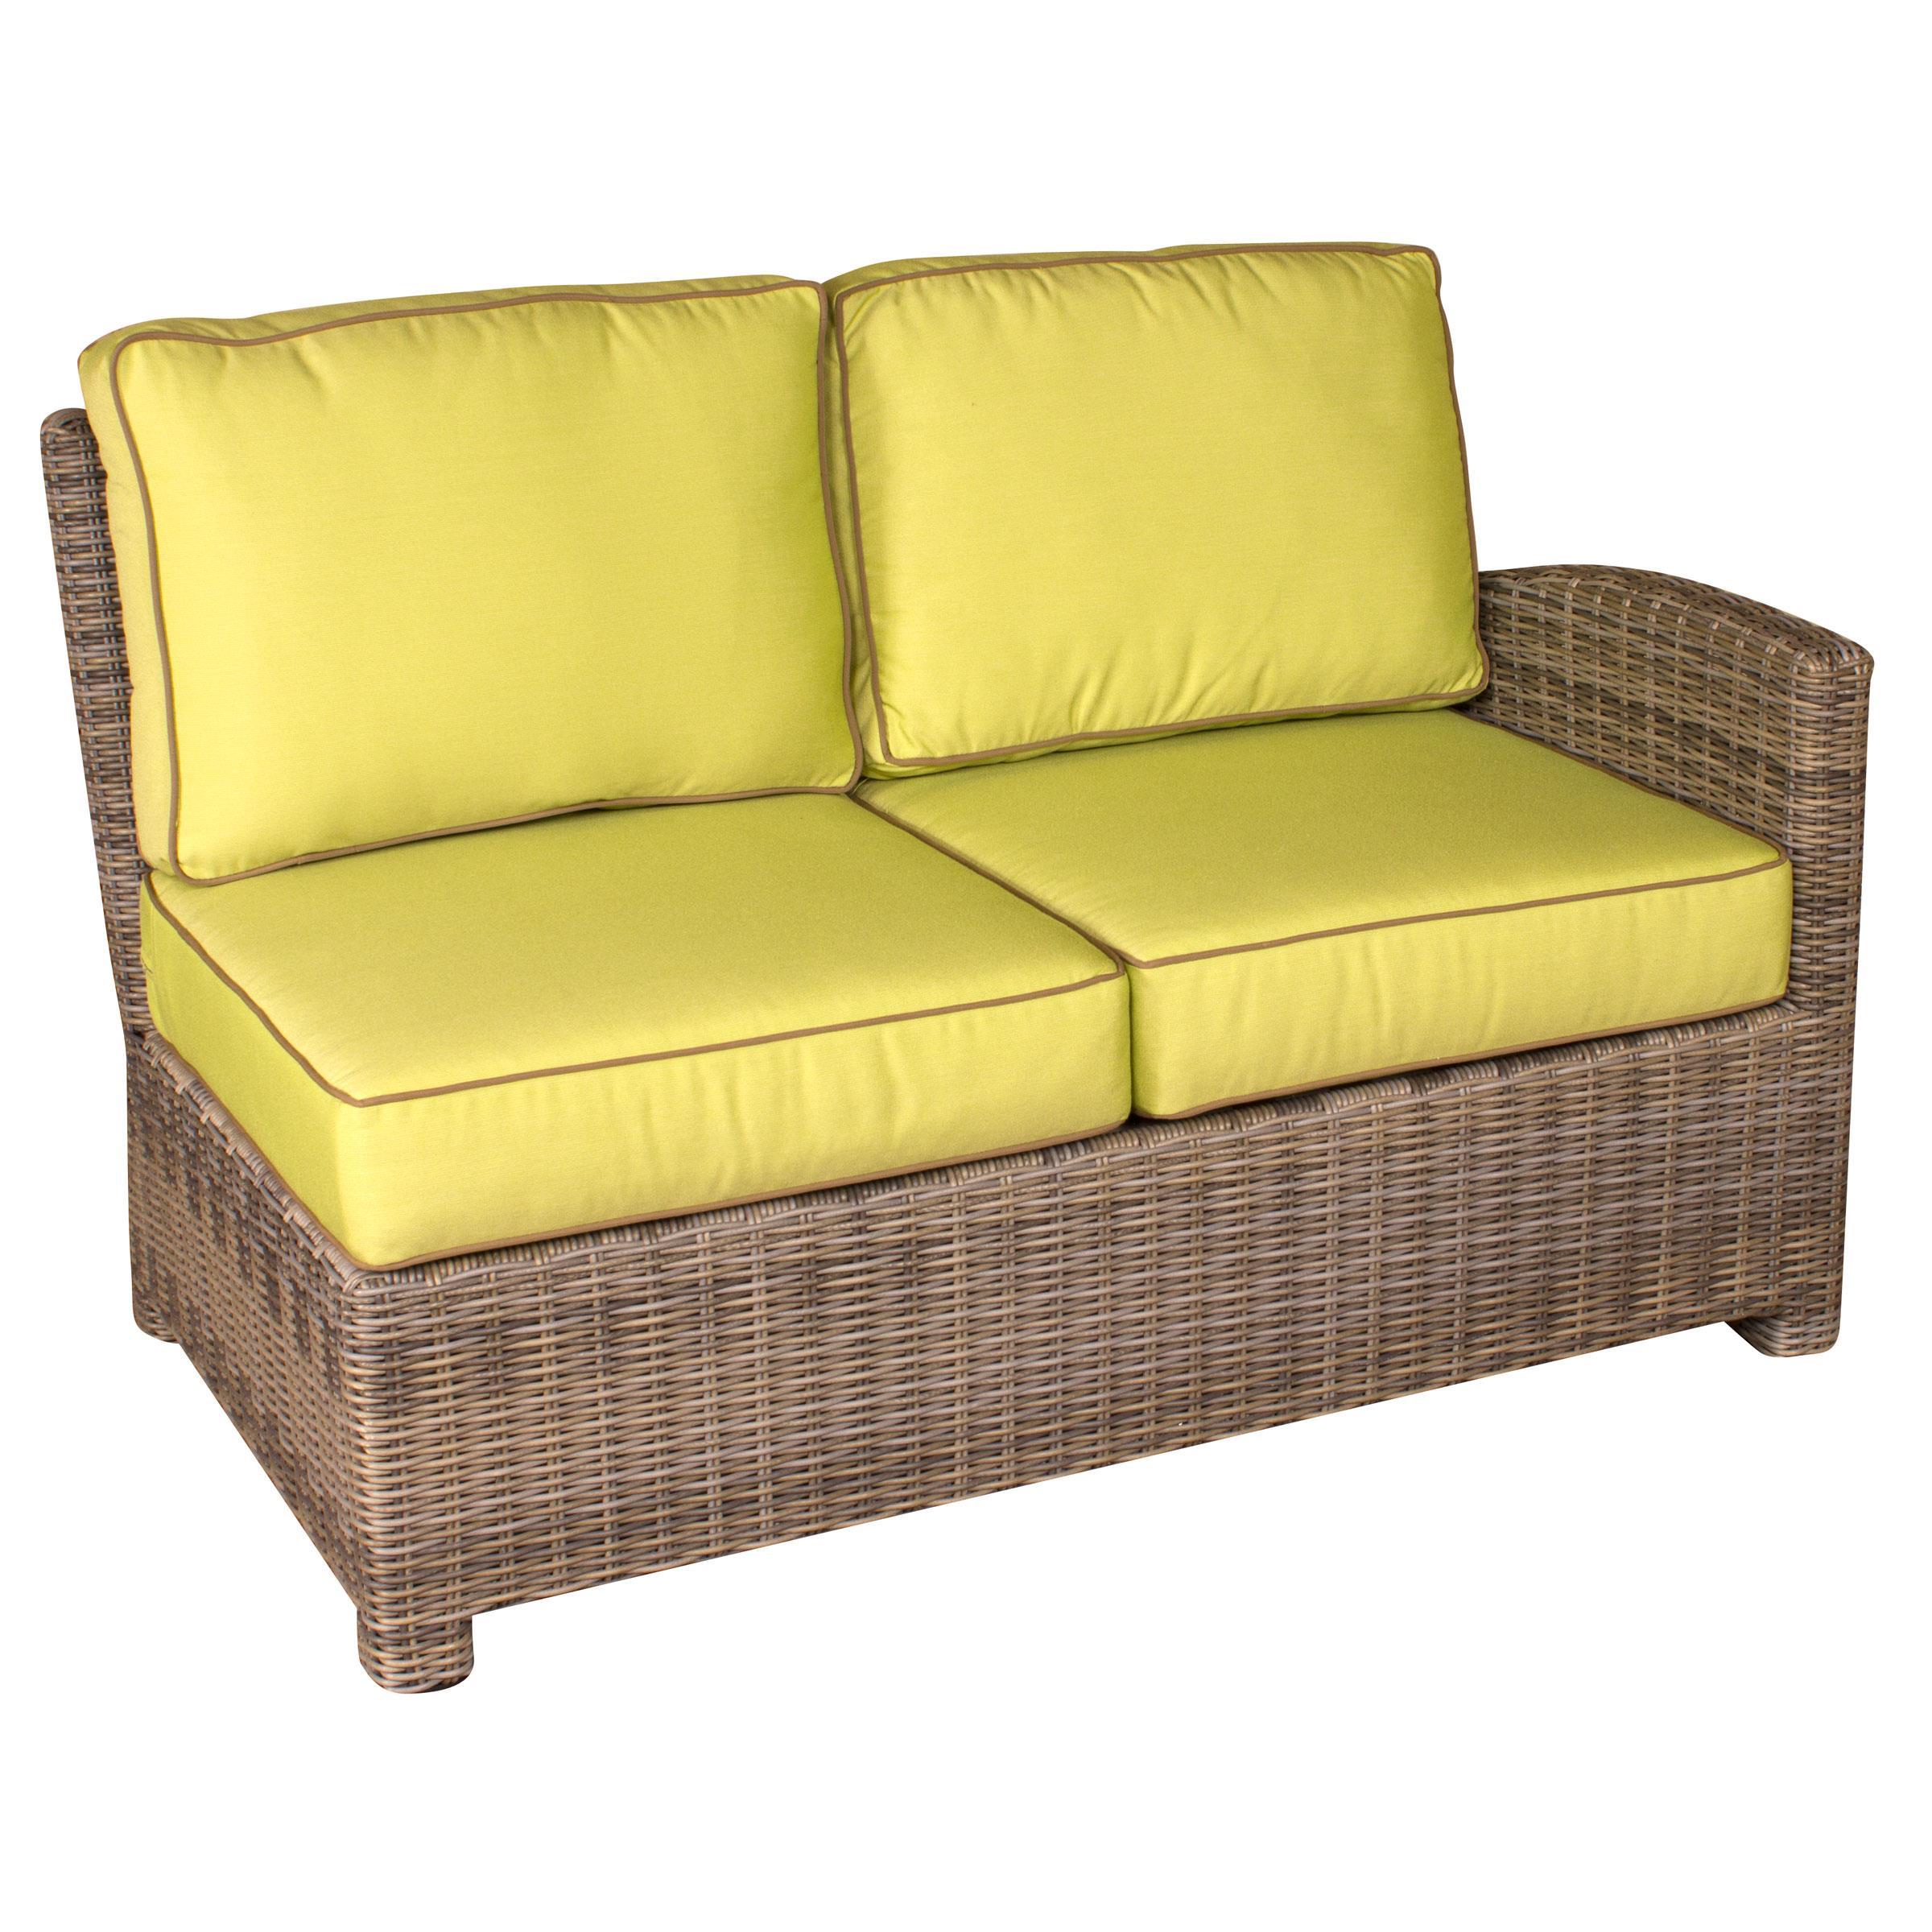 NorthCape International Bainbridge Sectional Right Arm W/ Cushion   Becker  Furniture World   Sectional Modular Piece